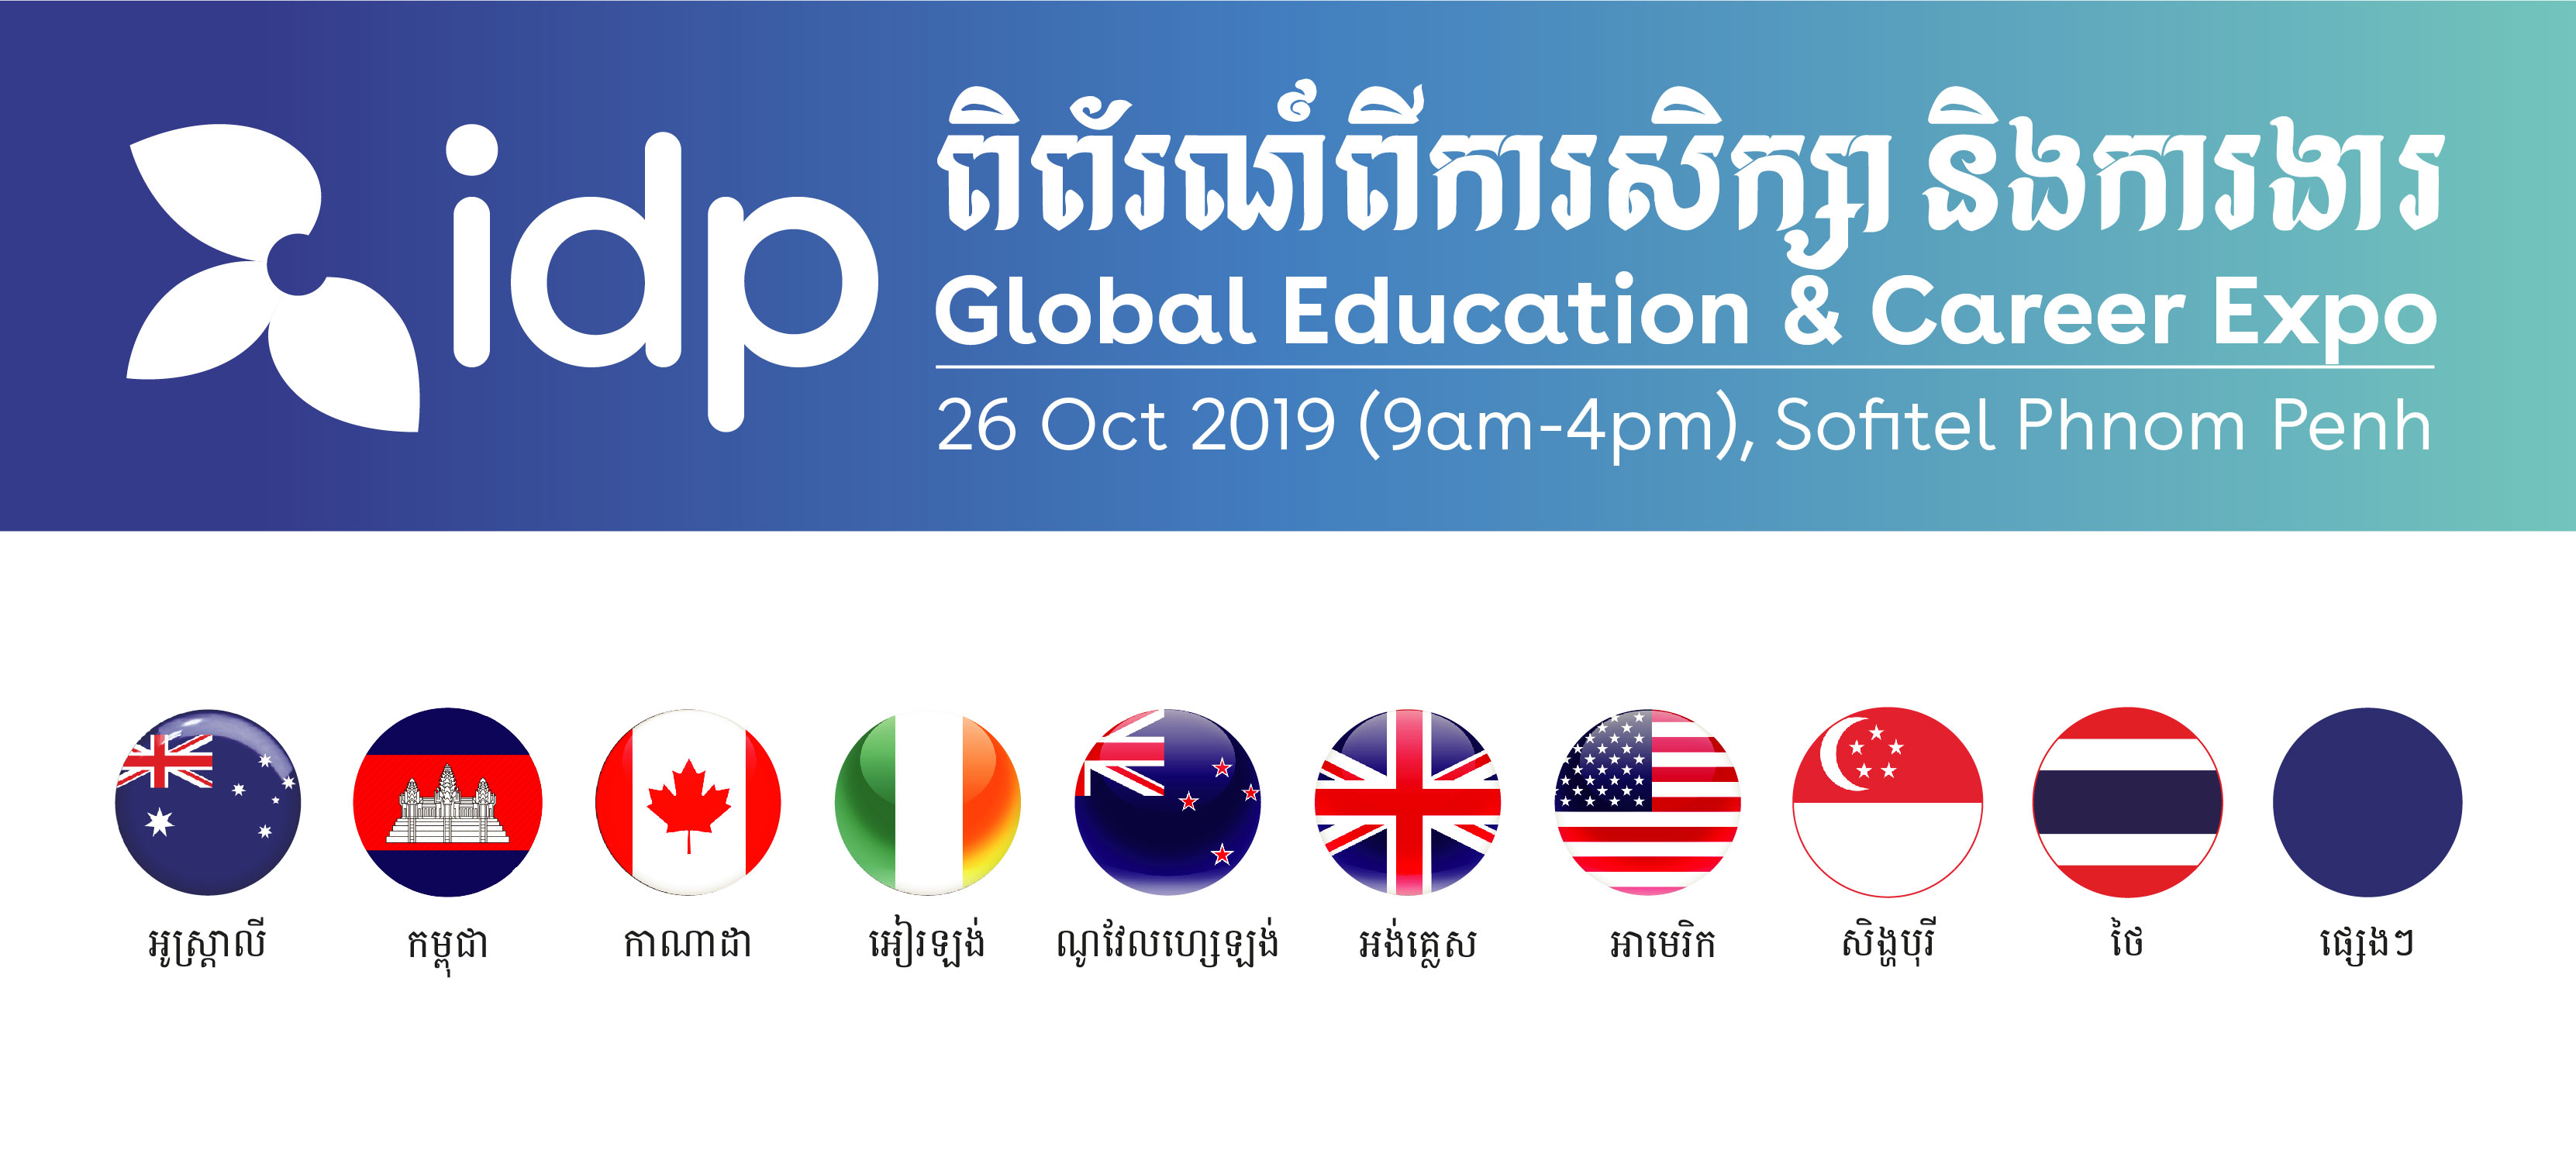 Global Education & Career Expo